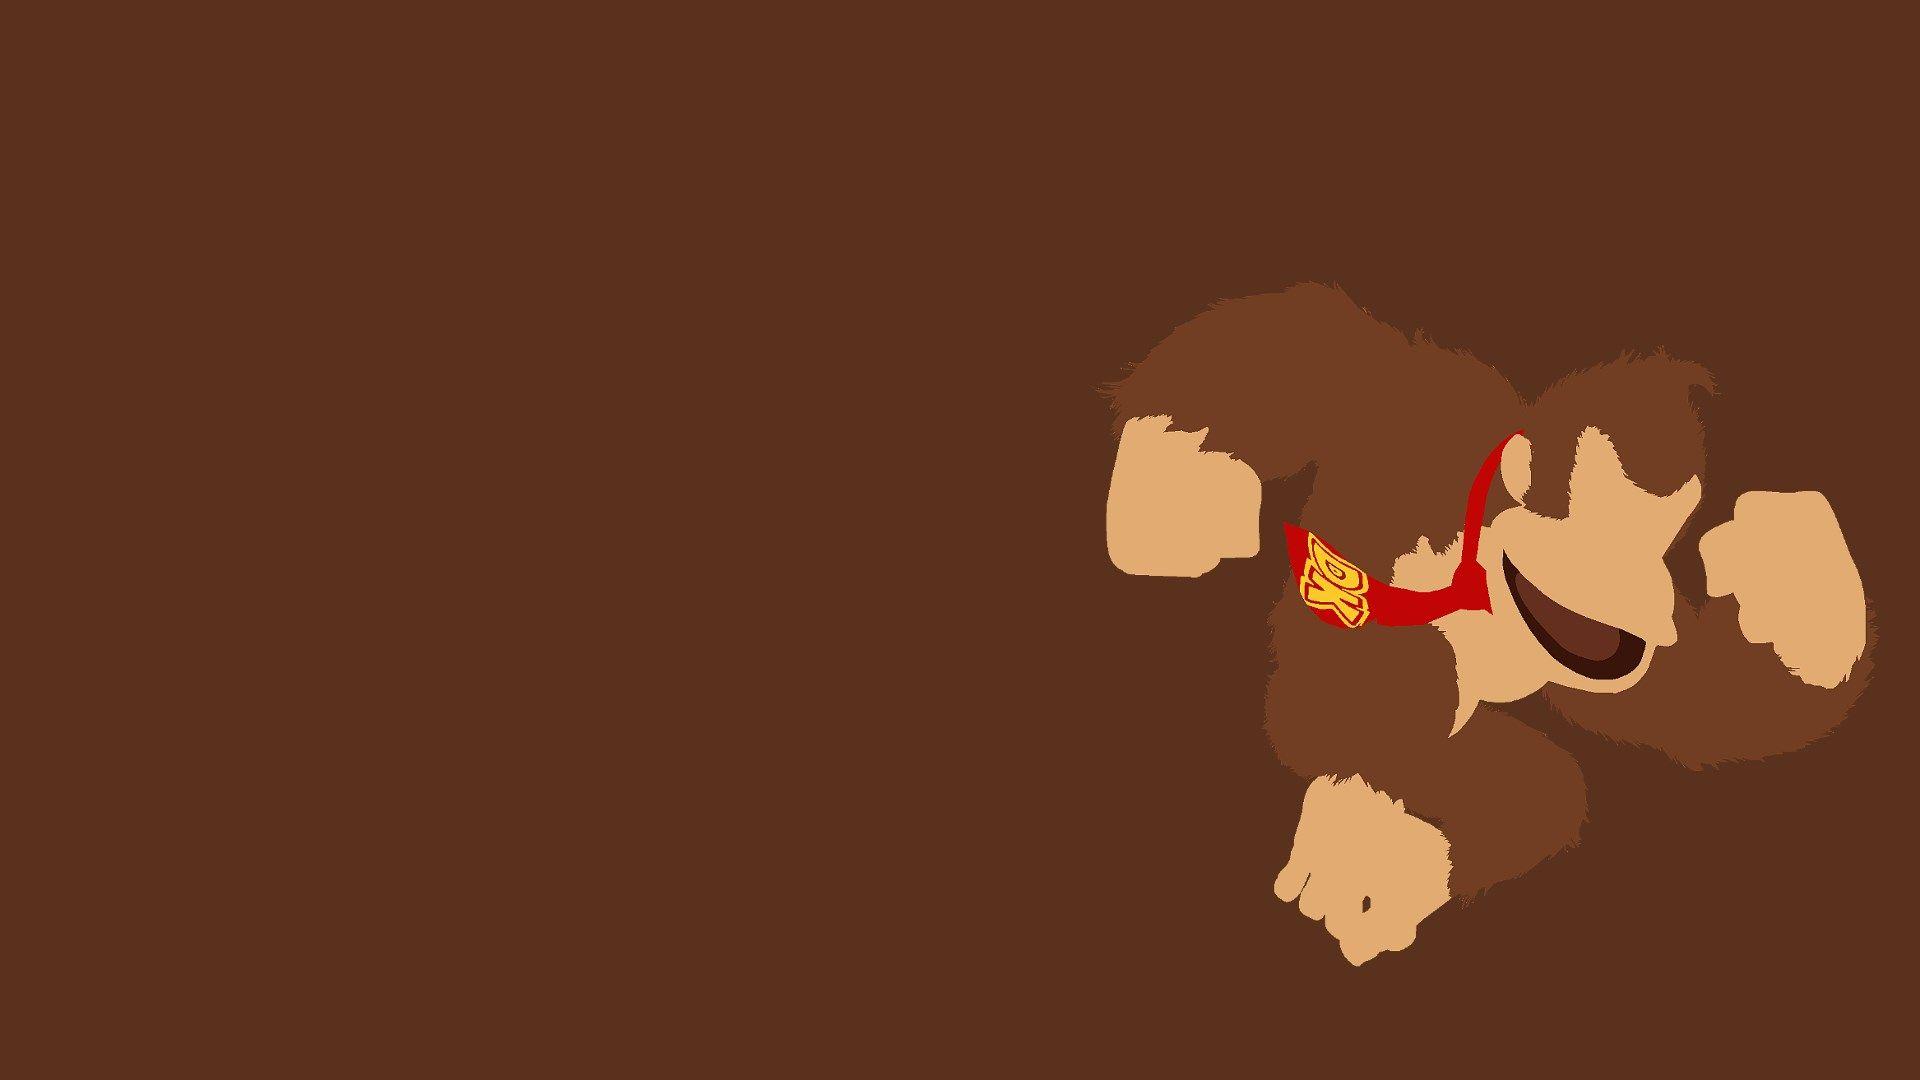 Donkey Kong Desktop Nexus Wallpaper Donkey Kong Country Donkey Kong Donkey Kong Country Returns